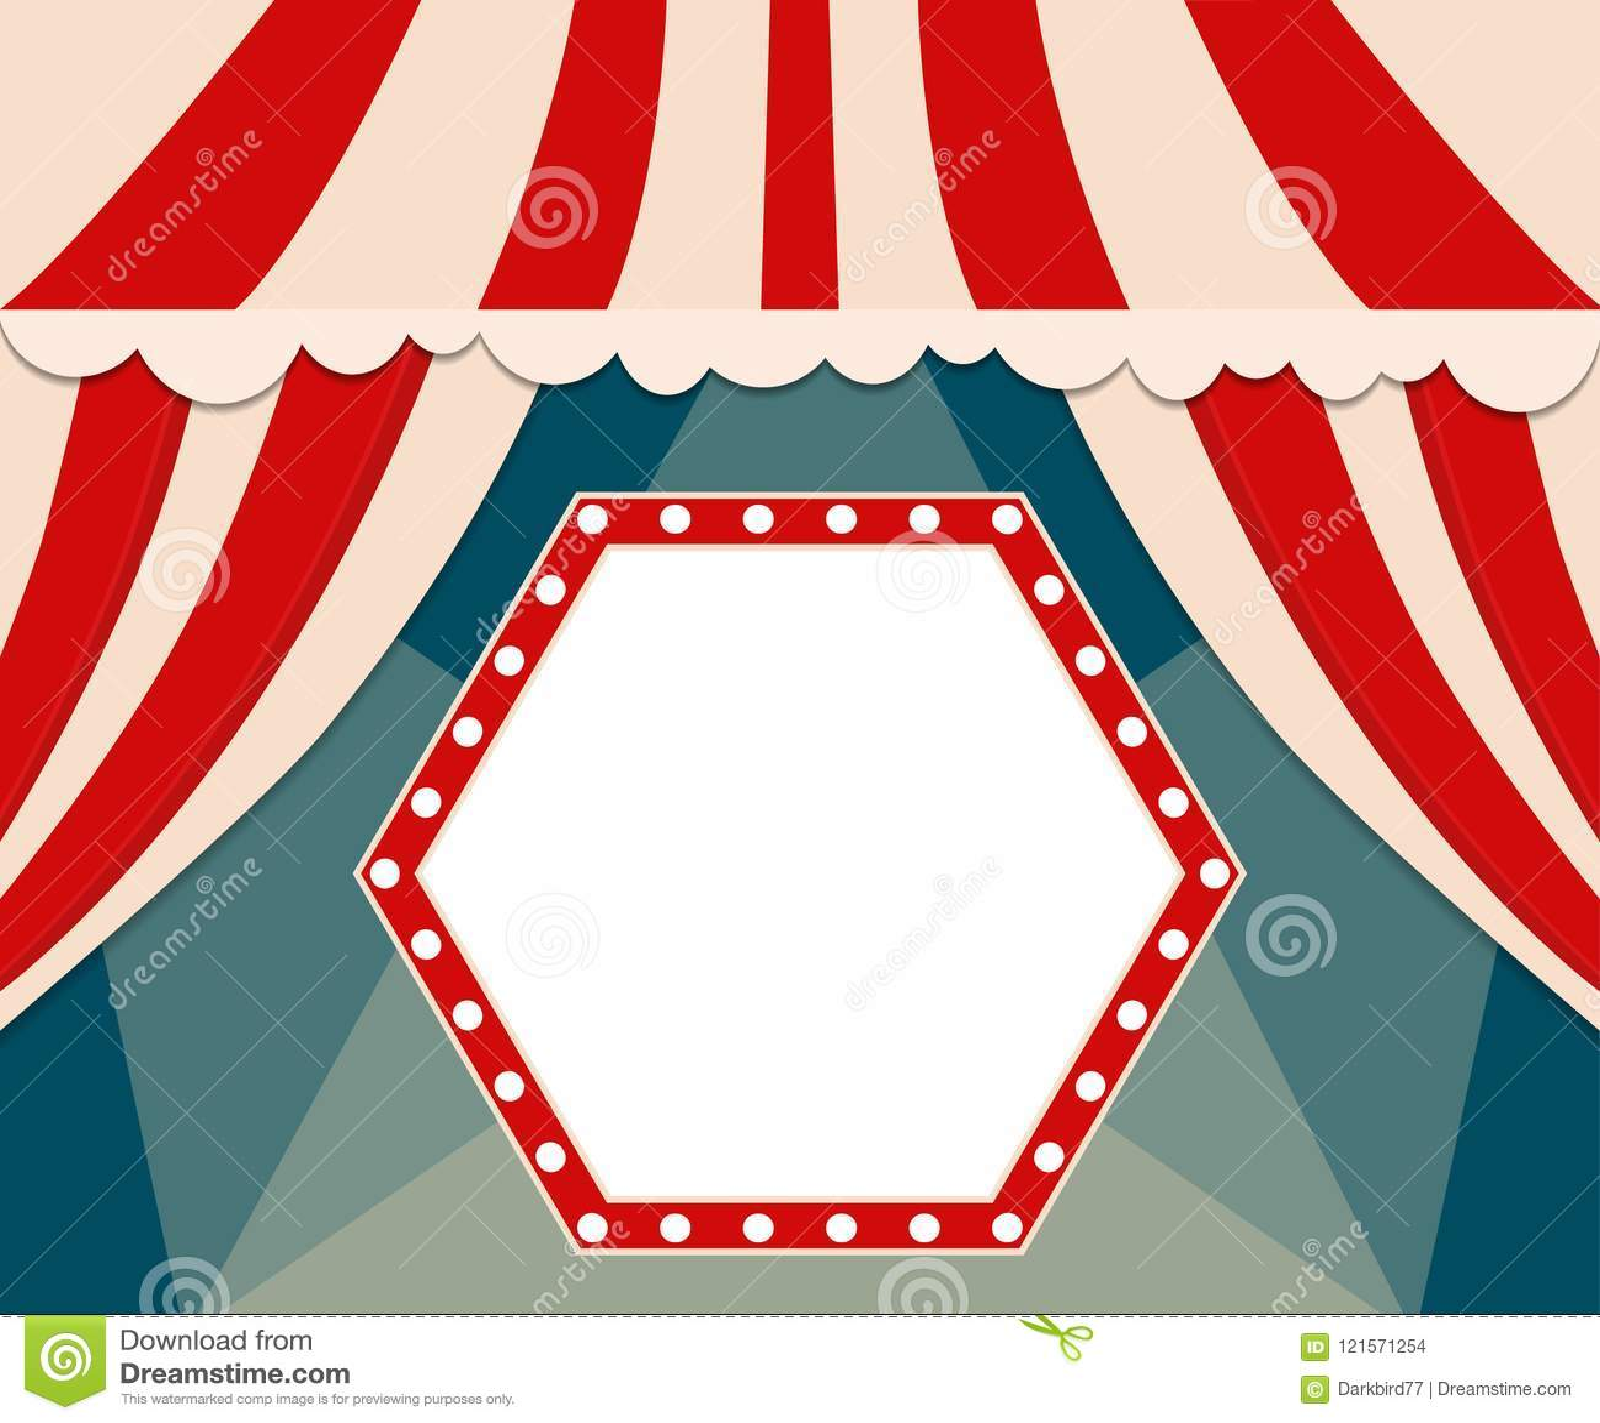 Poster Template With Retro Circus Banner Design For Presentatio